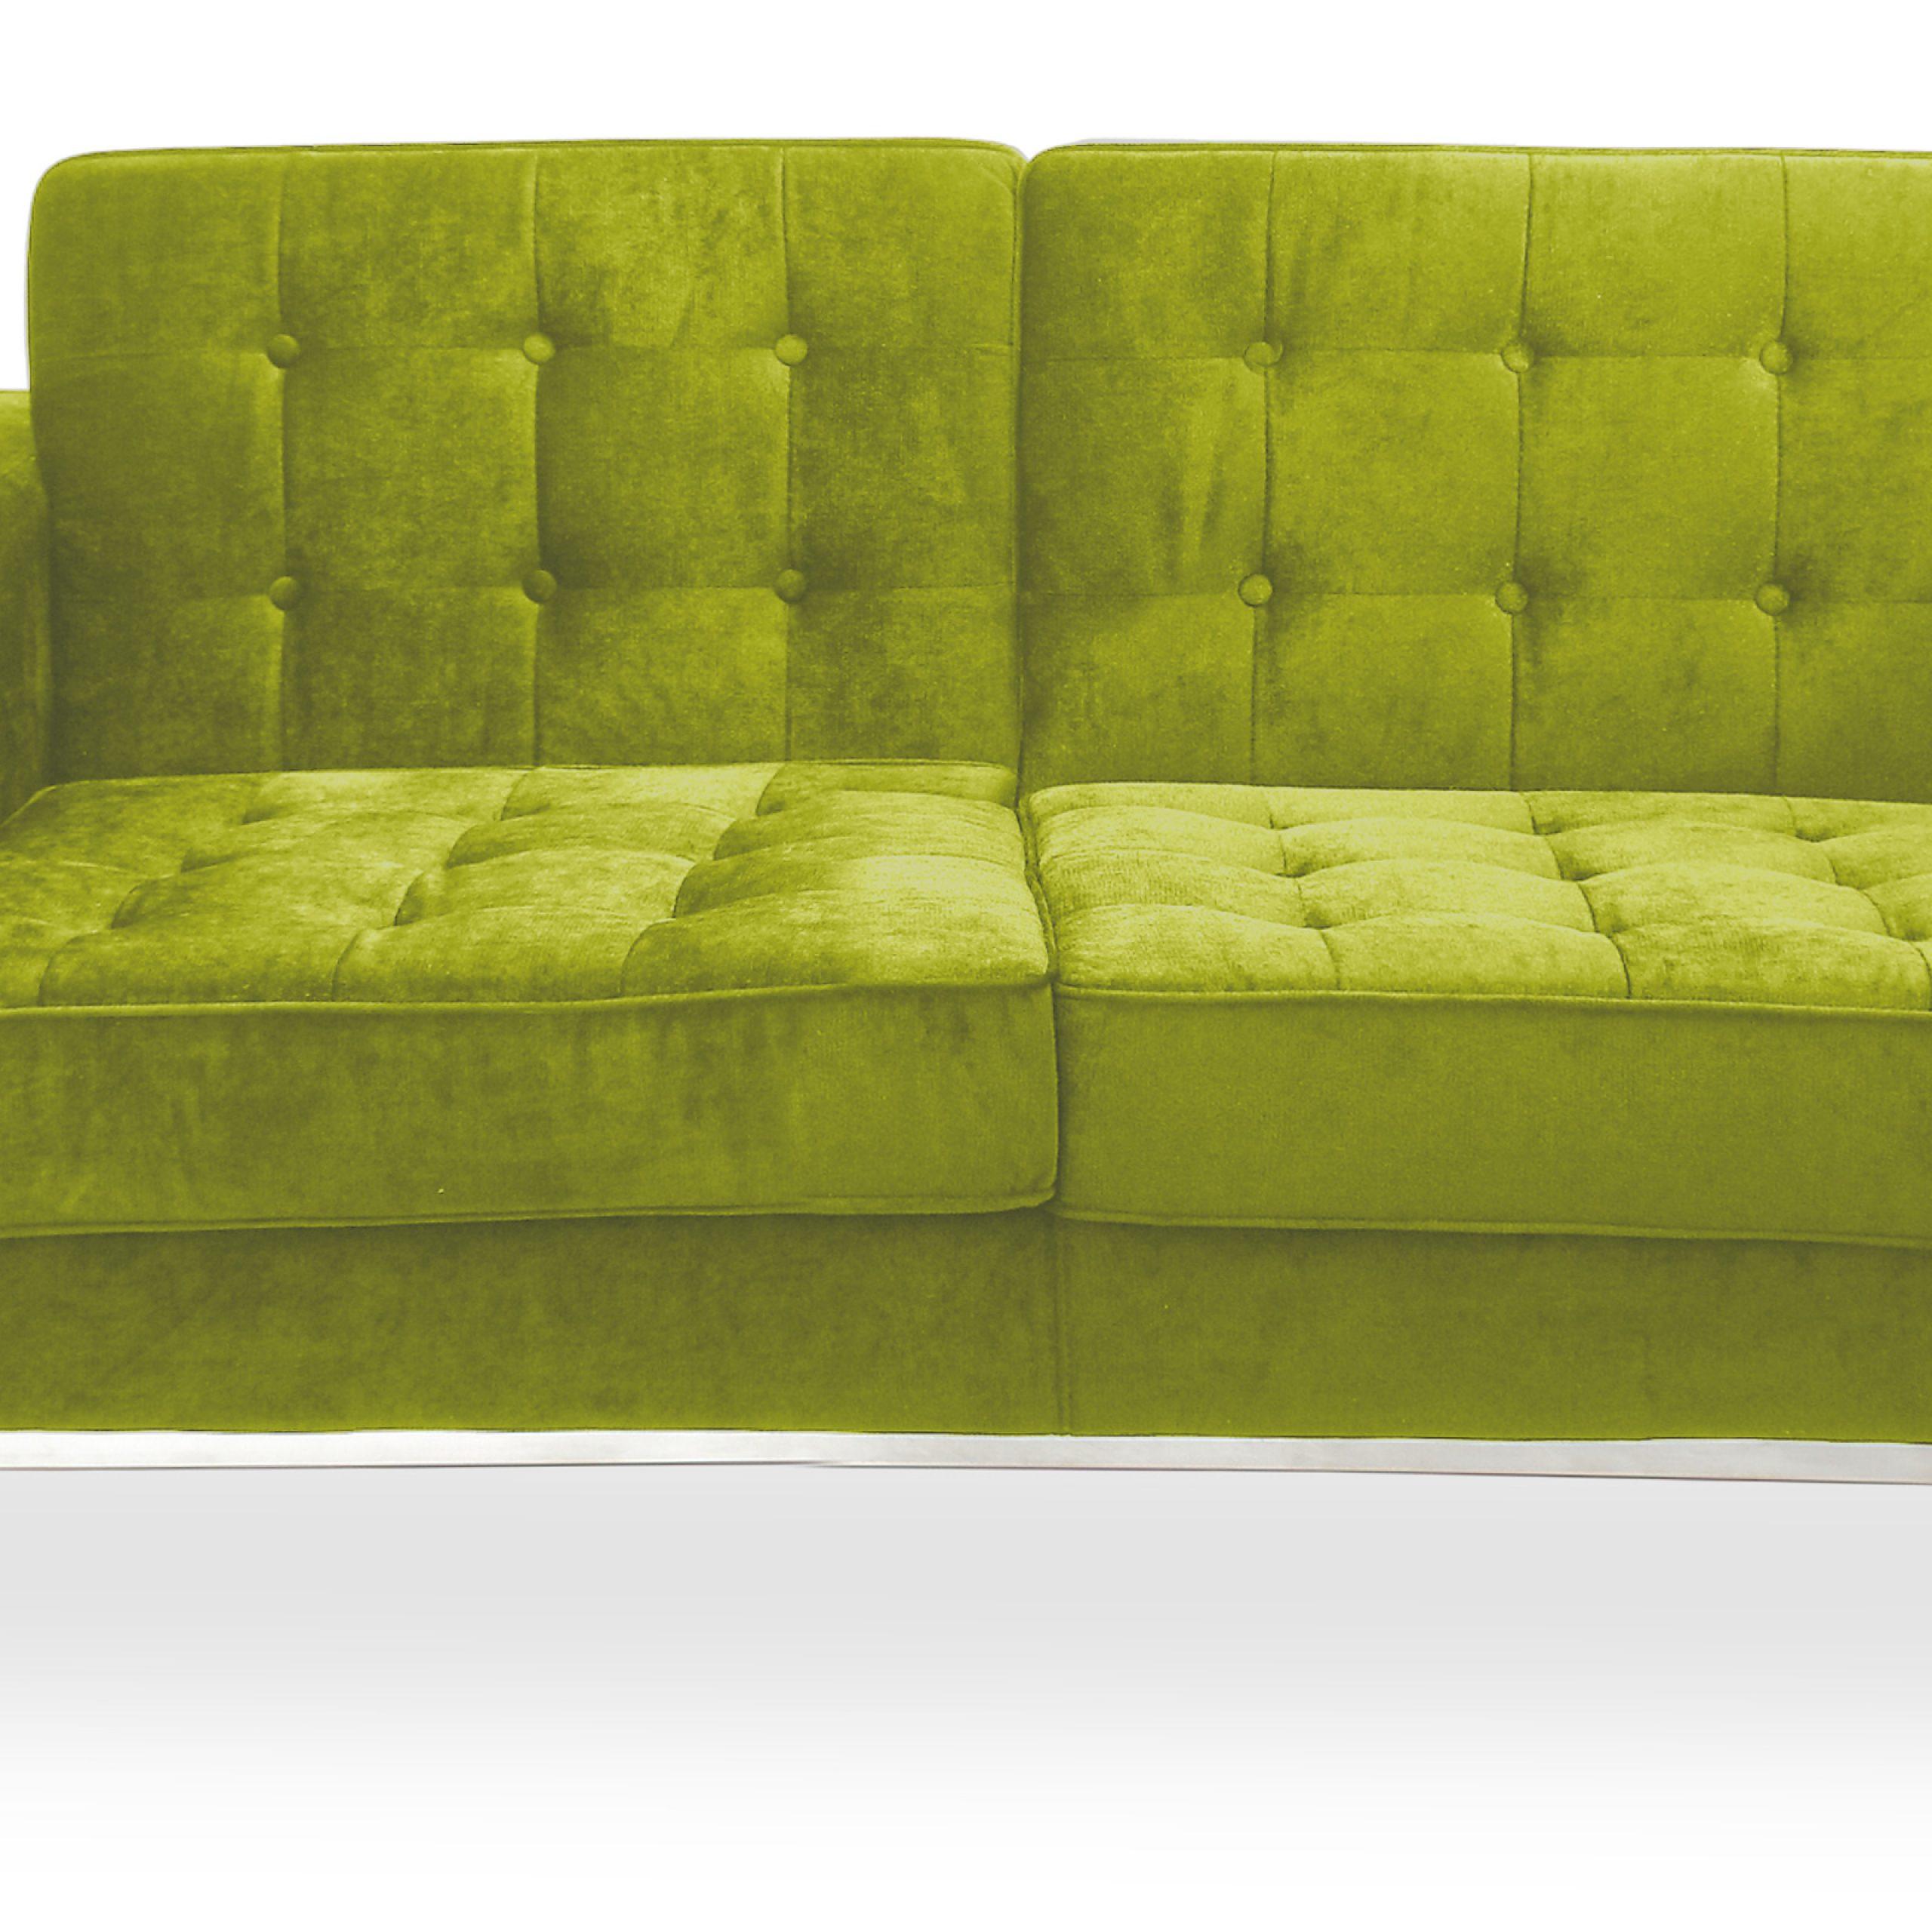 Buy 2 Seats Sofa Florence Knoll Style – Fabric Black 13241 Within Florence Knoll Fabric Sofas (View 7 of 15)